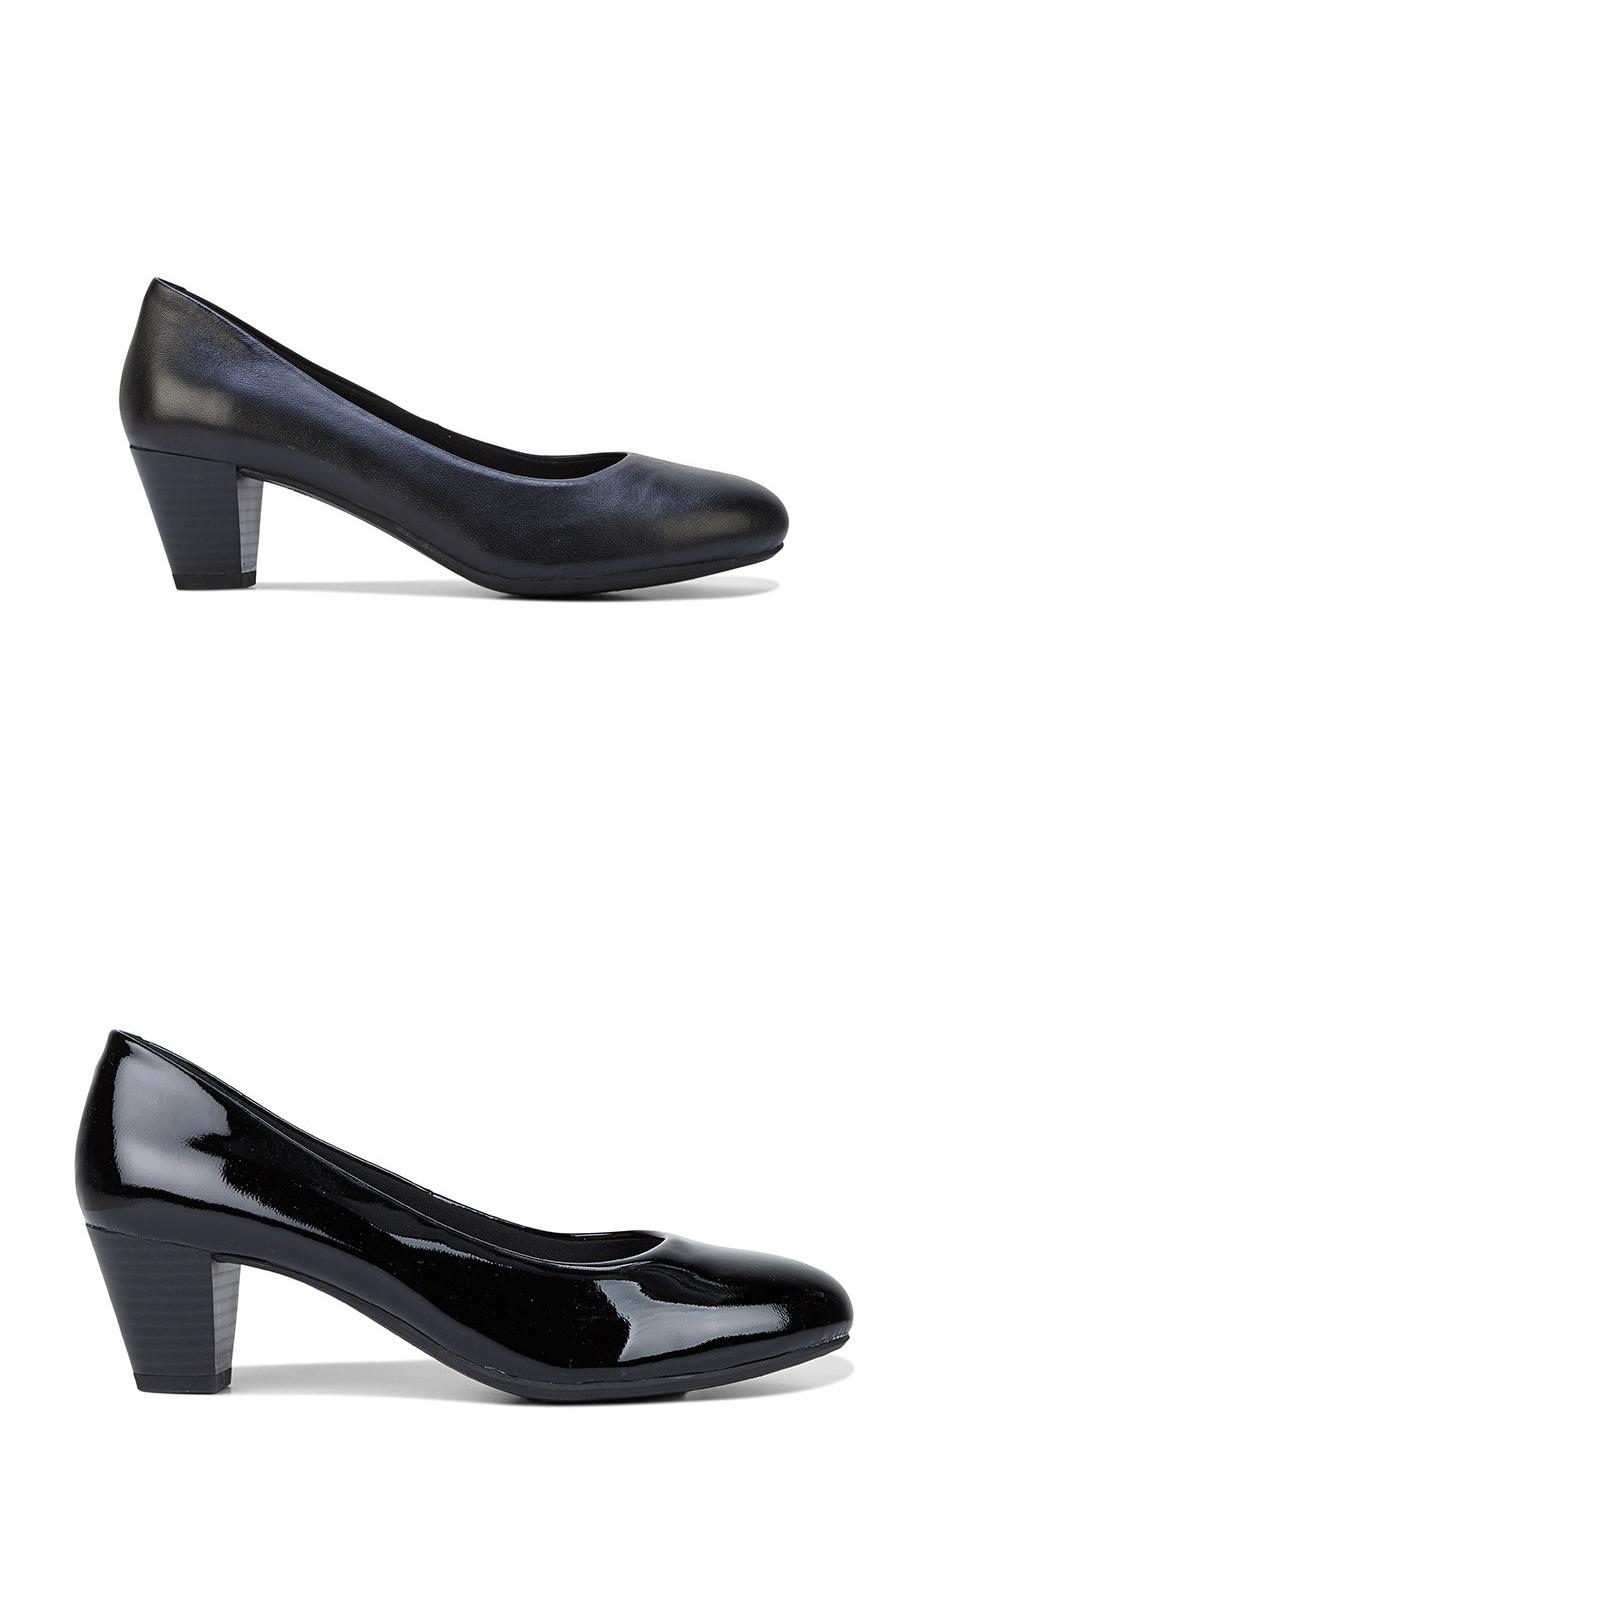 Womens Hush Puppies Carmel Leather Black Patent Heels Heels Heels Pumps Comfort Dress shoes 9edfef